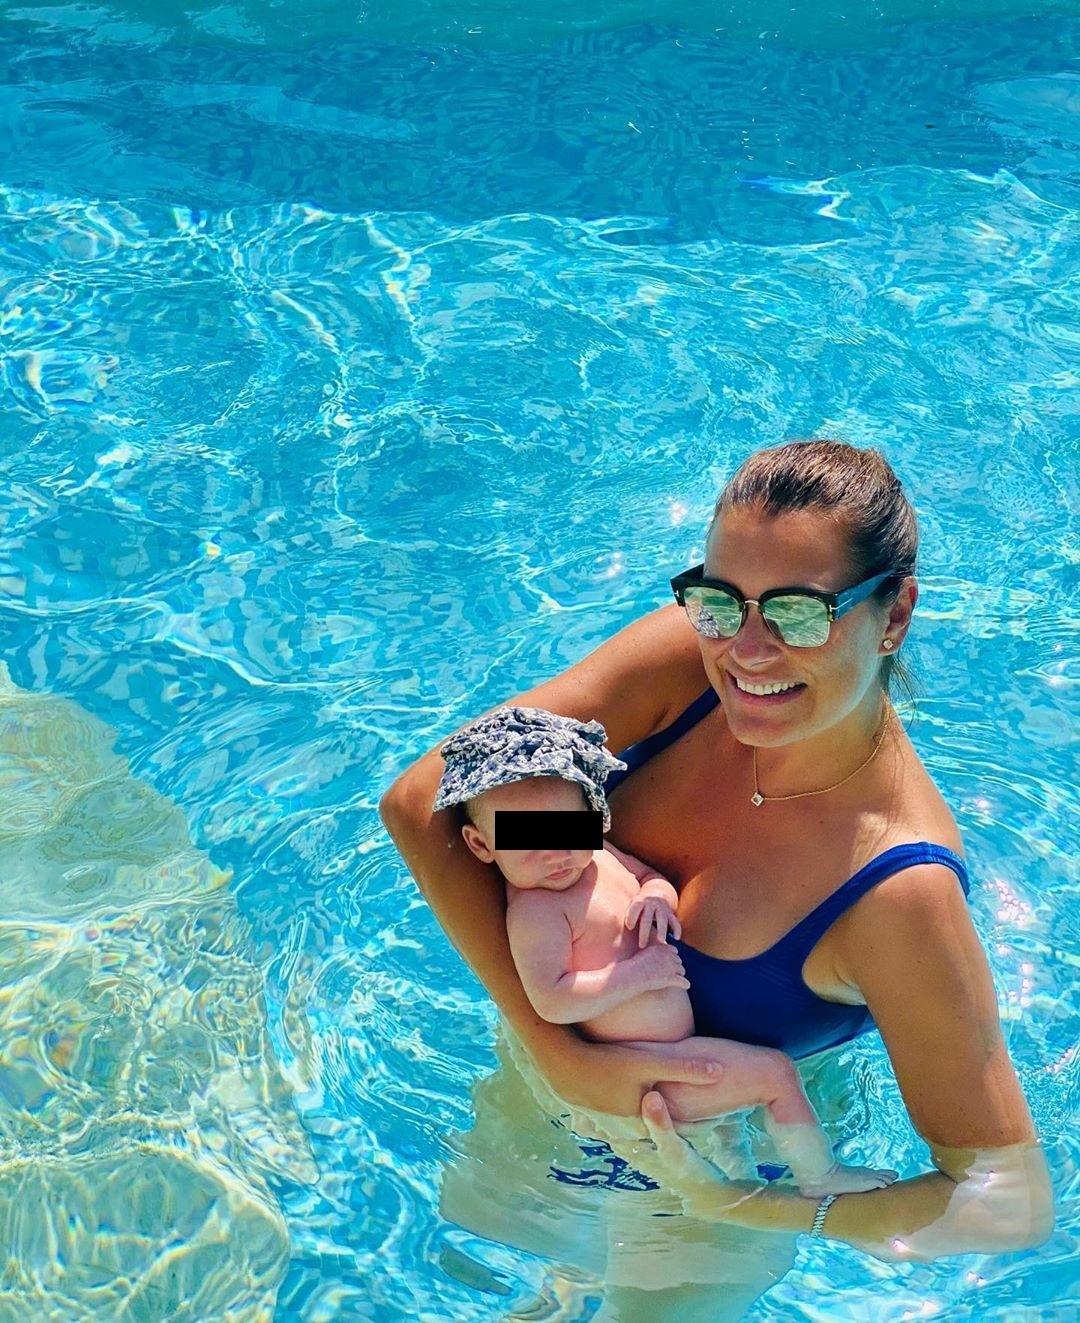 Alena Šeredová s malou Vivienne Charlotte v bazénu